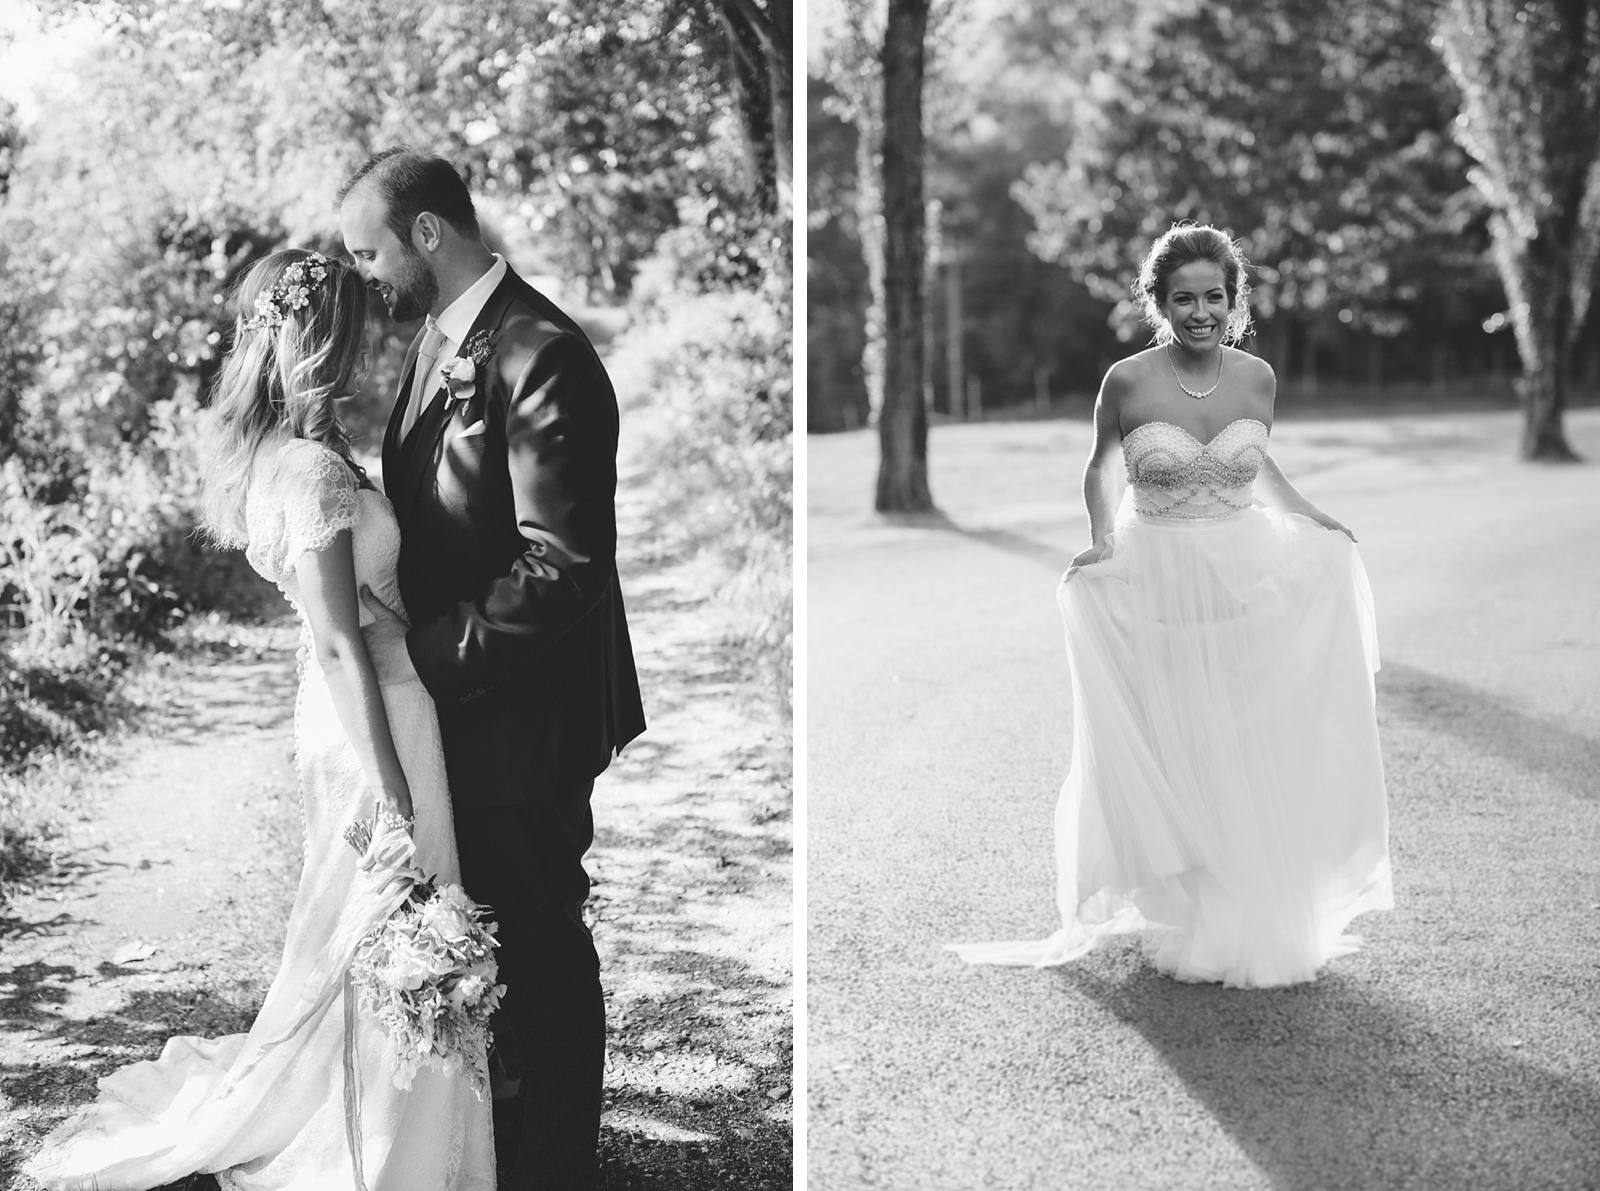 Black and white wedding photography alex dimos 094 alex dimos